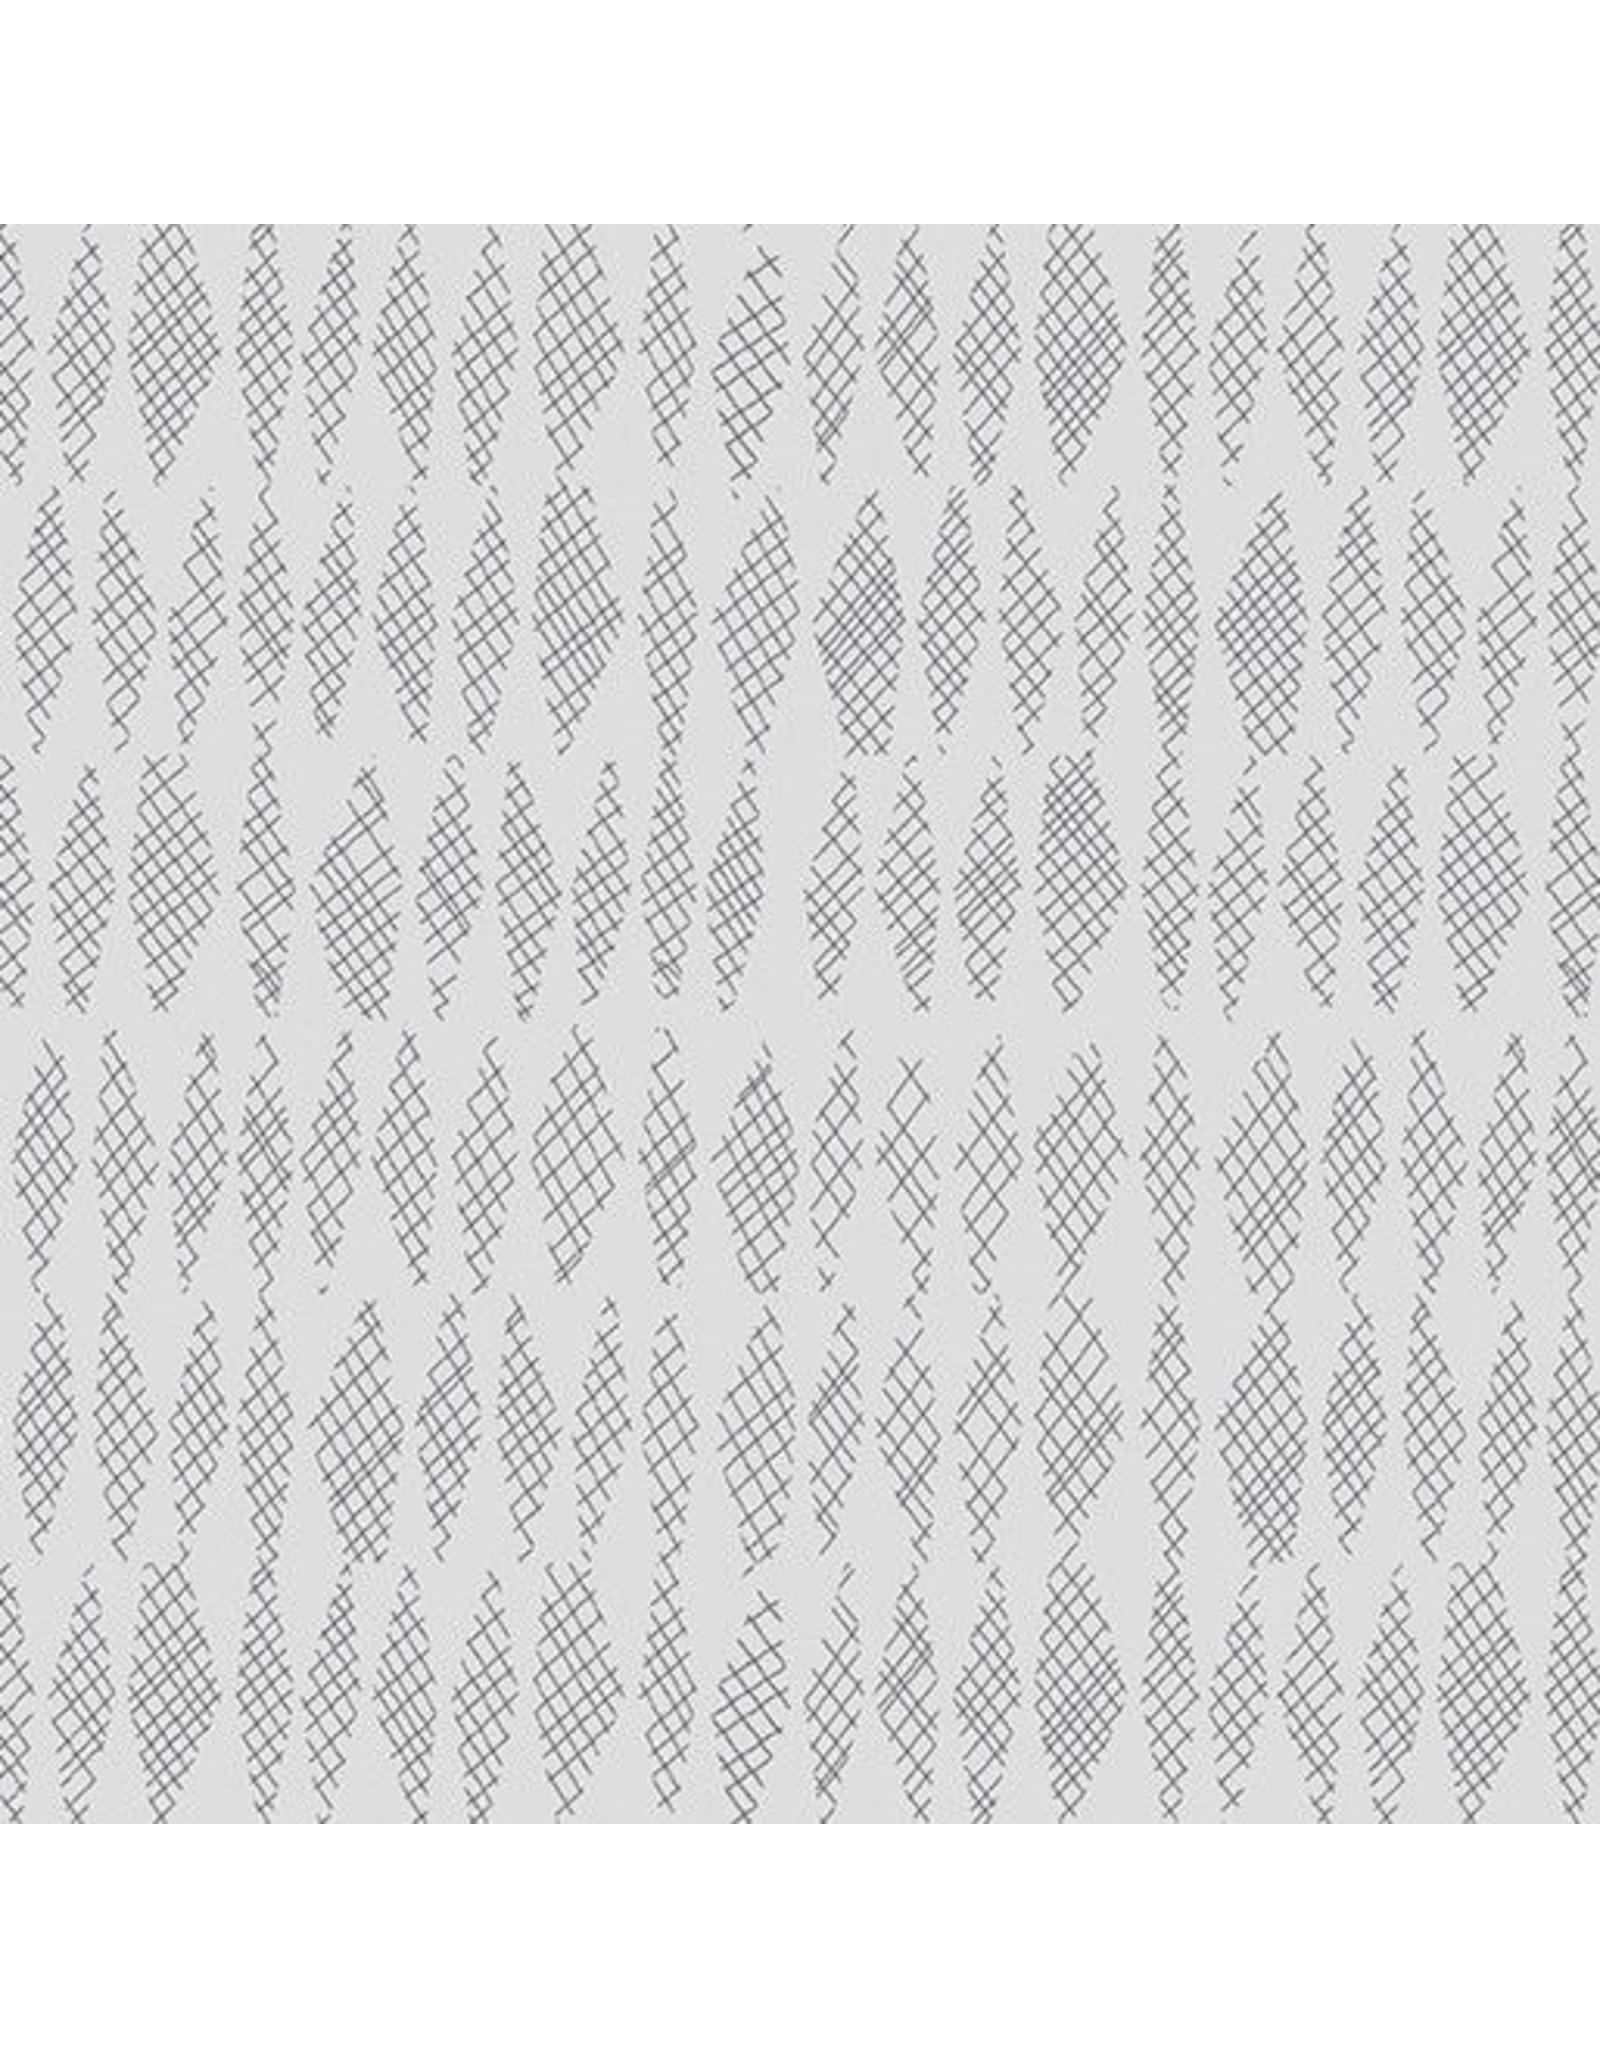 Contempo Improv - Twisted Screen Grey